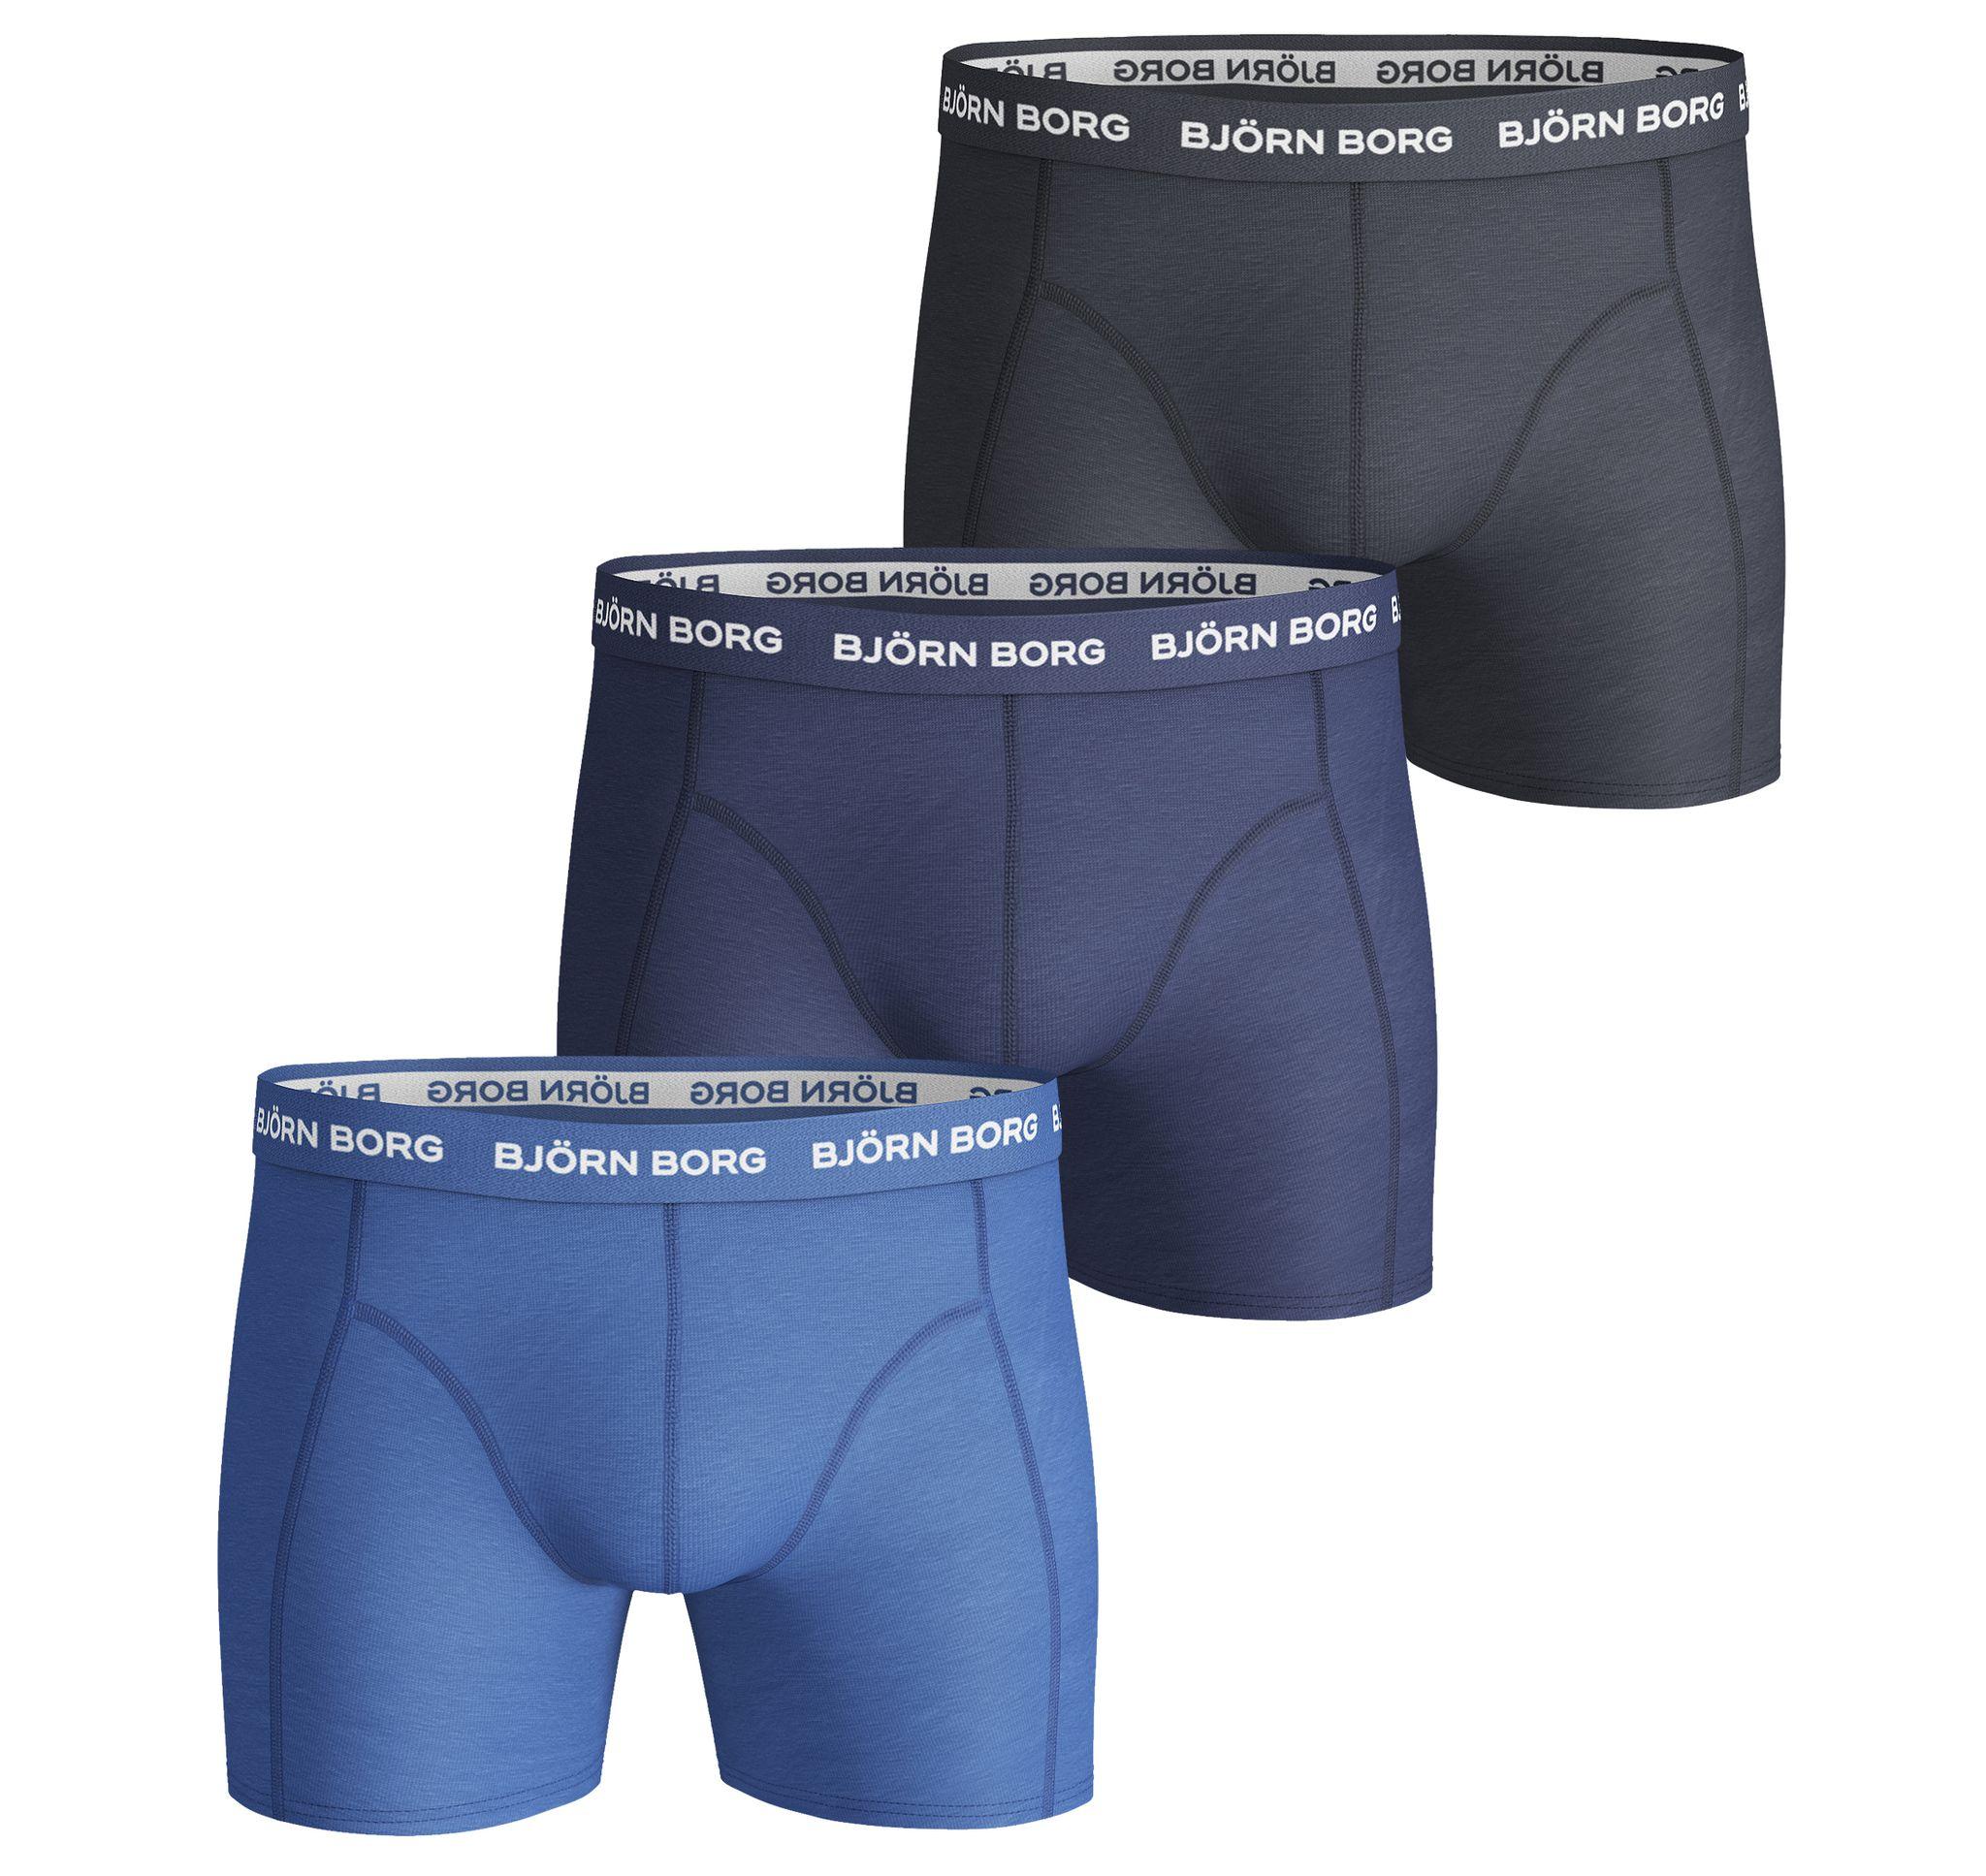 3p Shorts Noos Solids, Skydiver, L,  Kalsonger